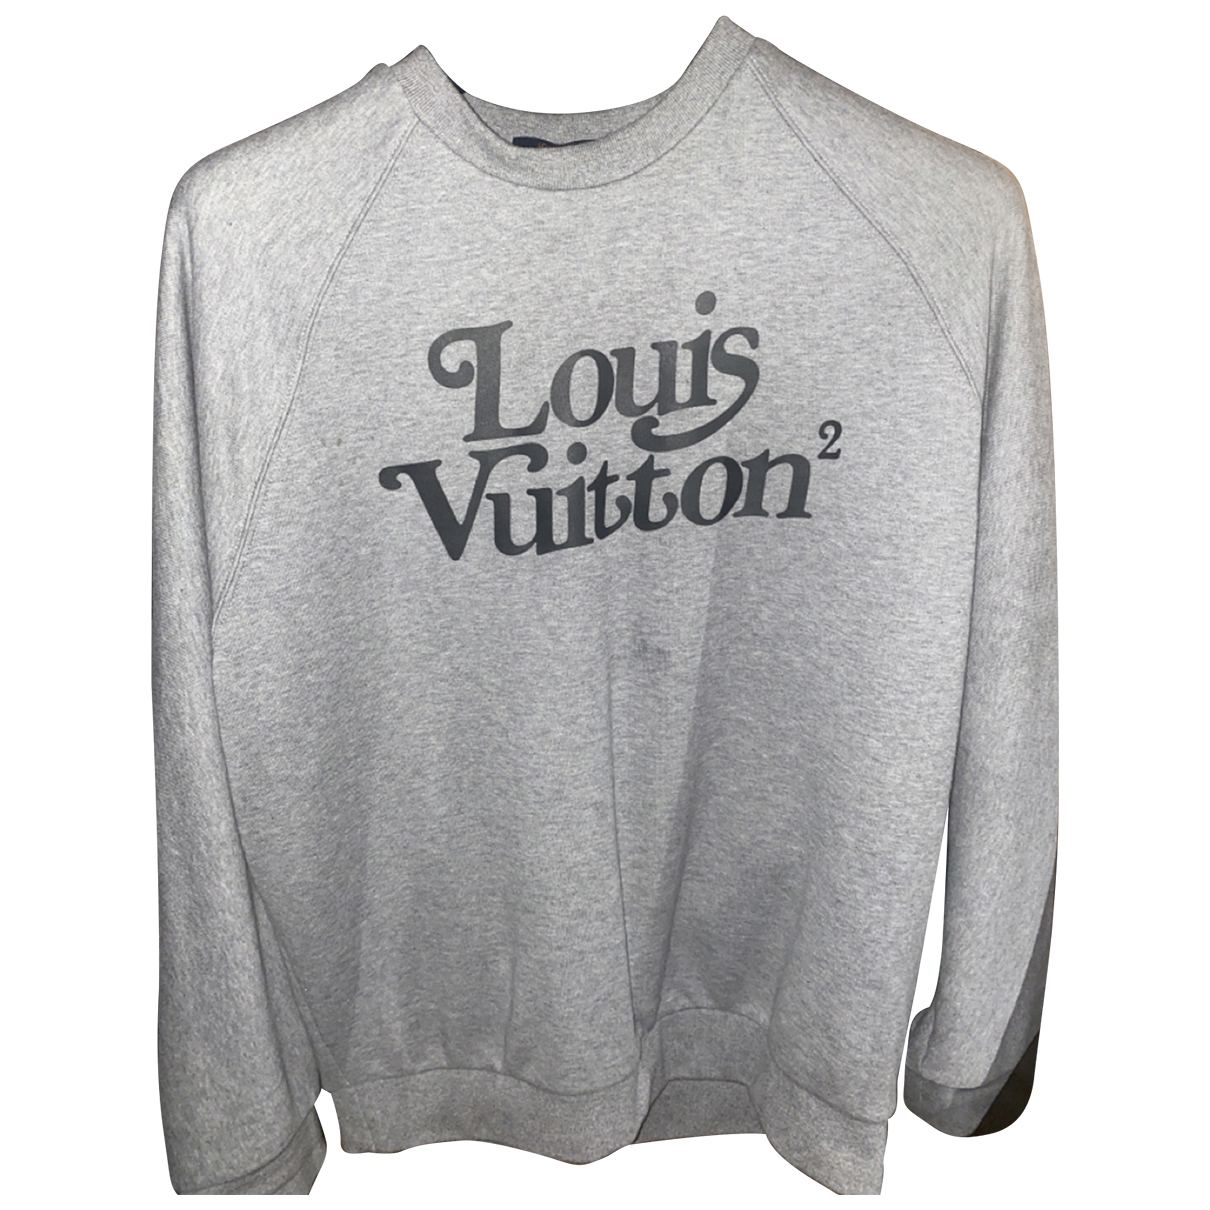 Sudadera Louis Vuitton